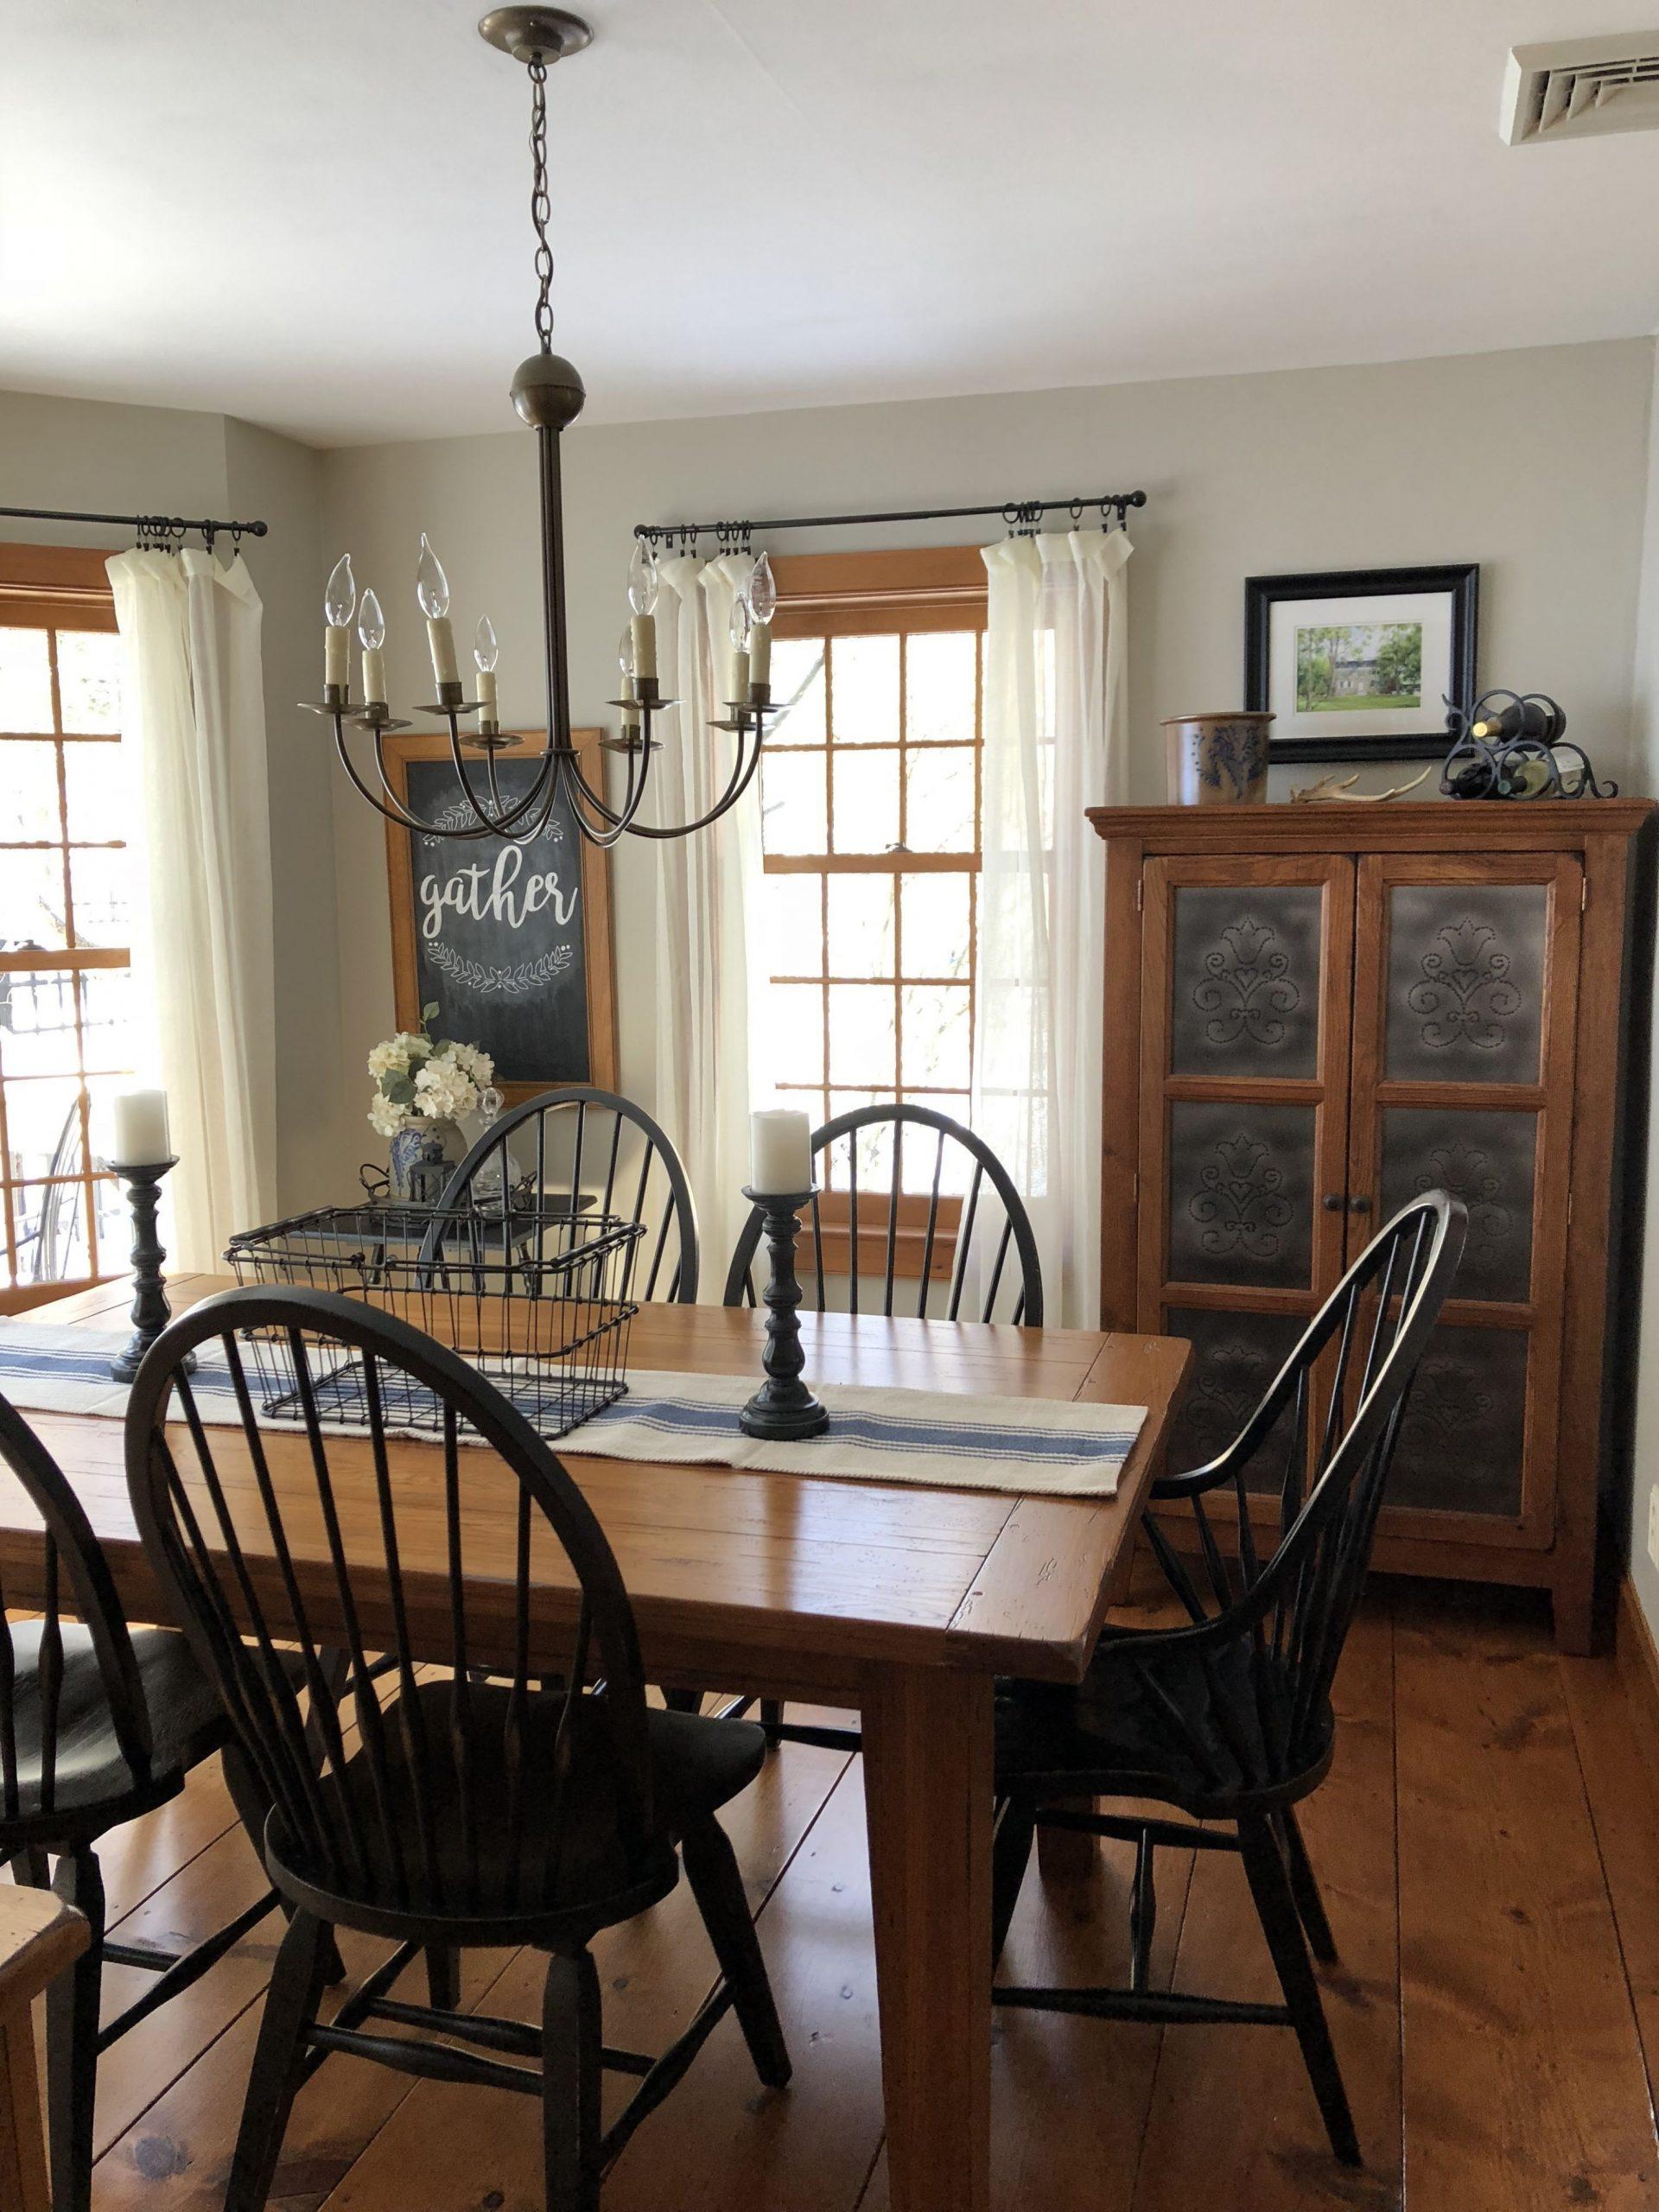 Epic Dining Room Ideas - June, 9  Ruokapöytä, Sisustus  - Dining Room Ideas Uk 2018